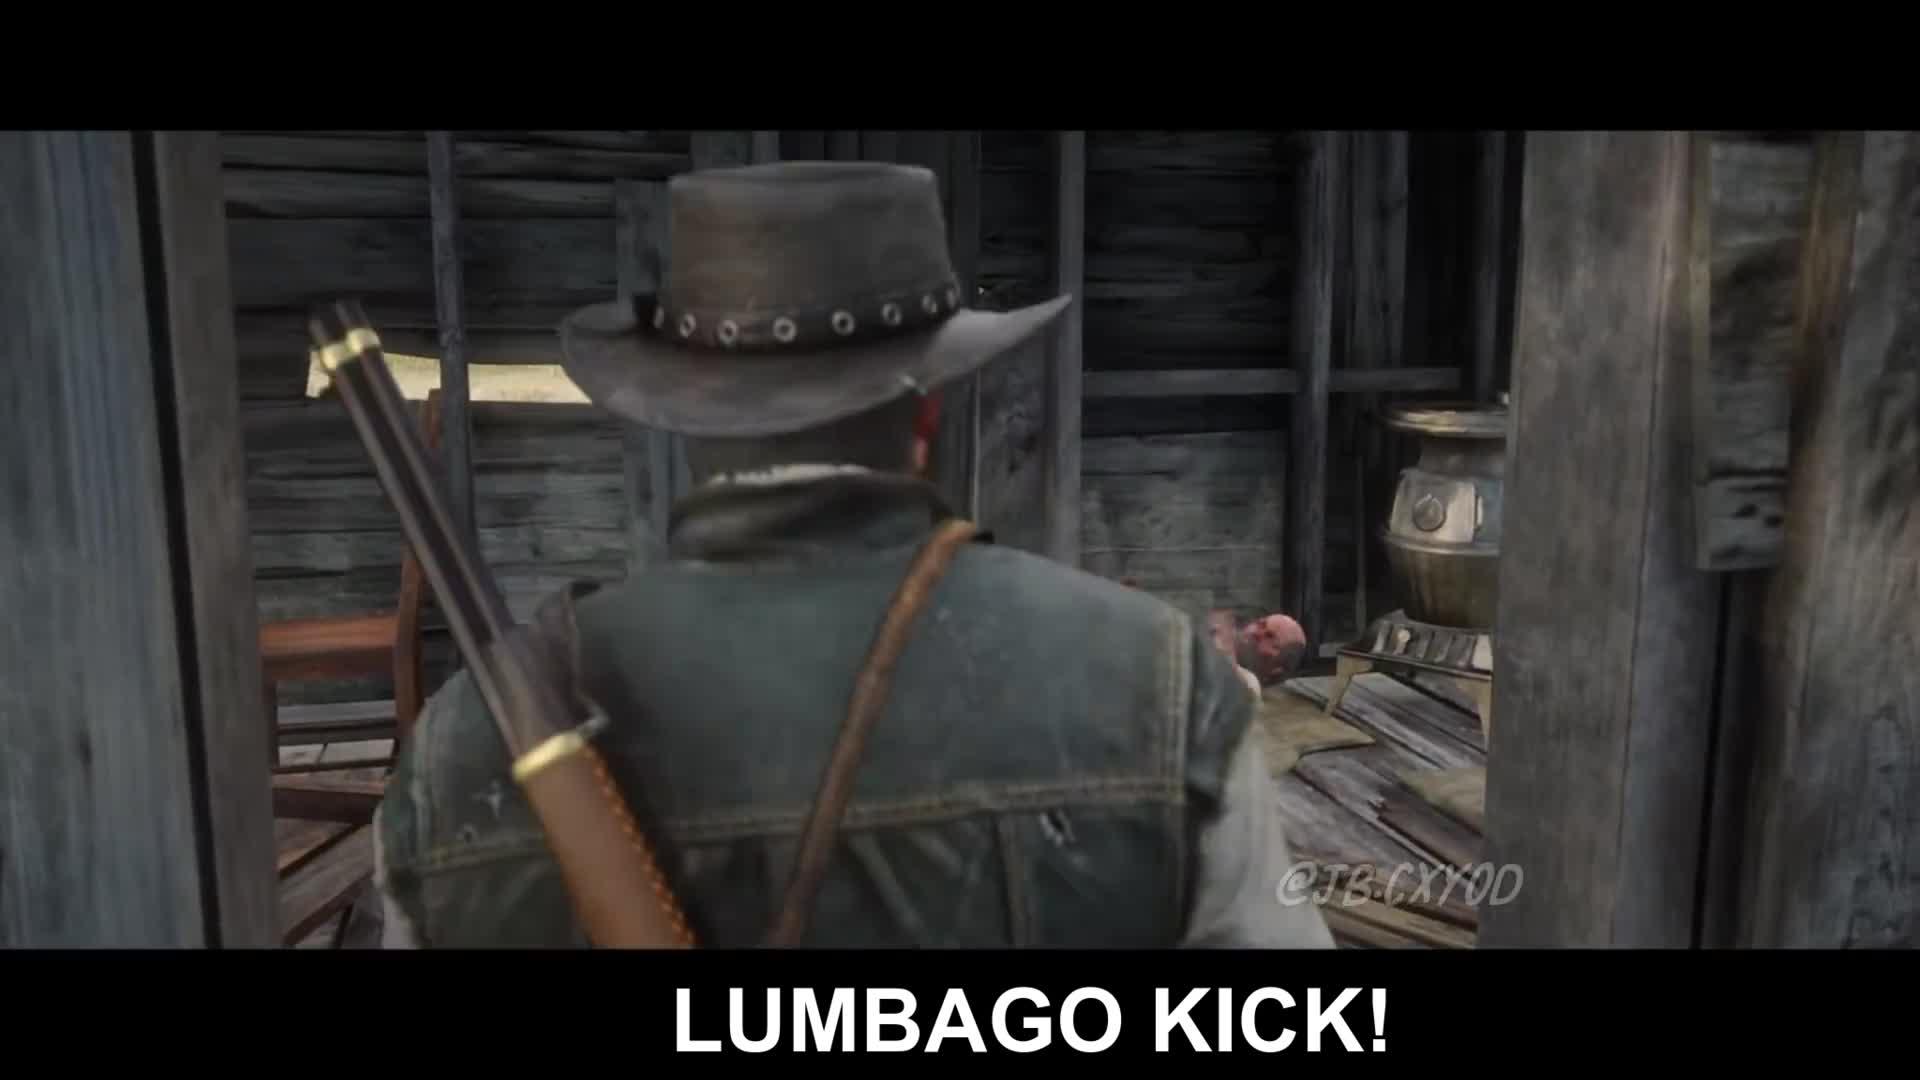 Red Dead Redemption 2 Glitches Gifs Search | Search & Share